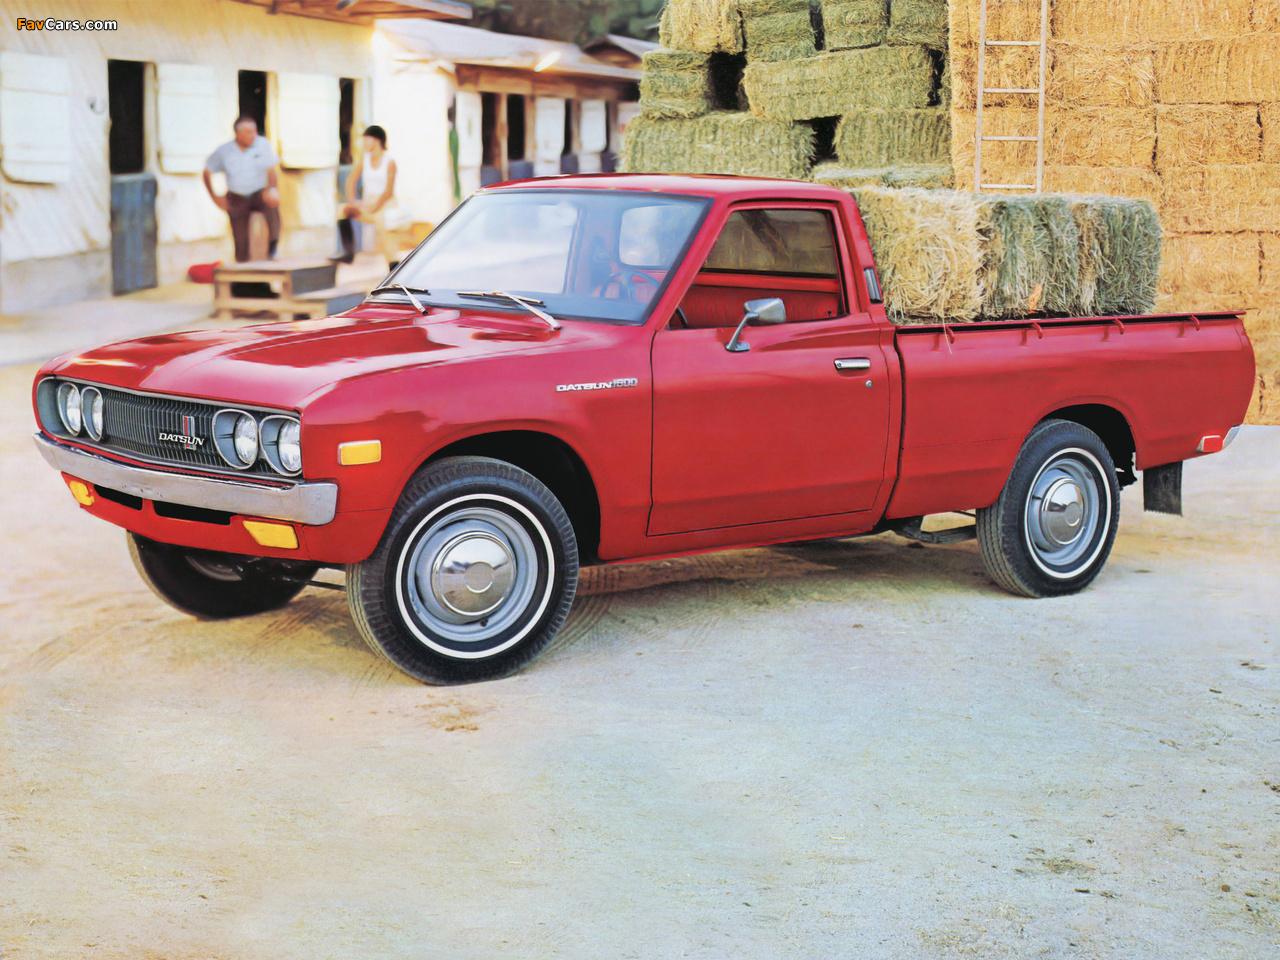 1024x768 Car Wallpapers Datsun Pickup 620 1972 79 Wallpapers 1280x960